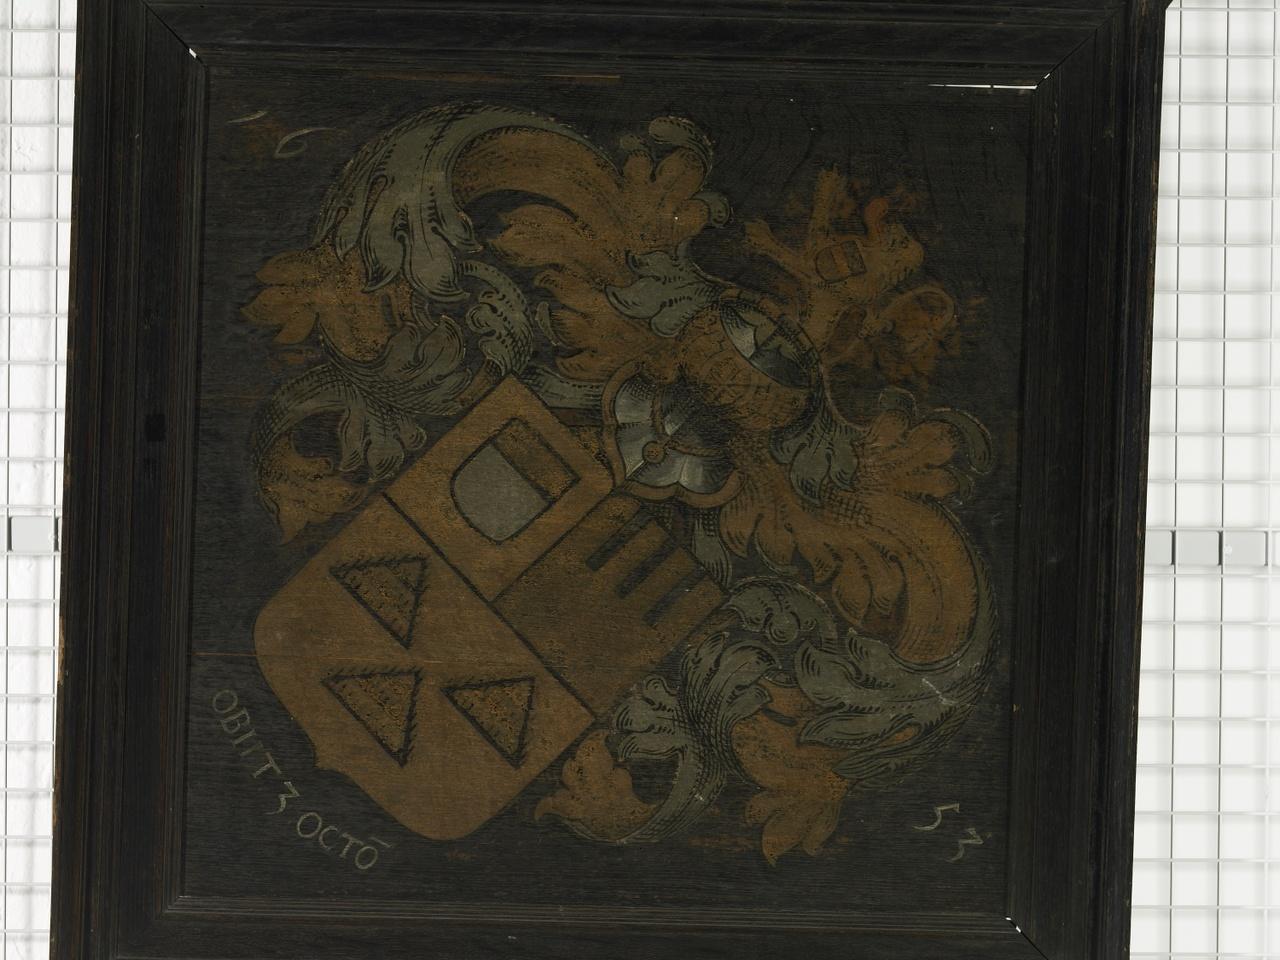 Wapenbord van Marcus Zuerius van Boxhorn (1616-1653), Anoniem